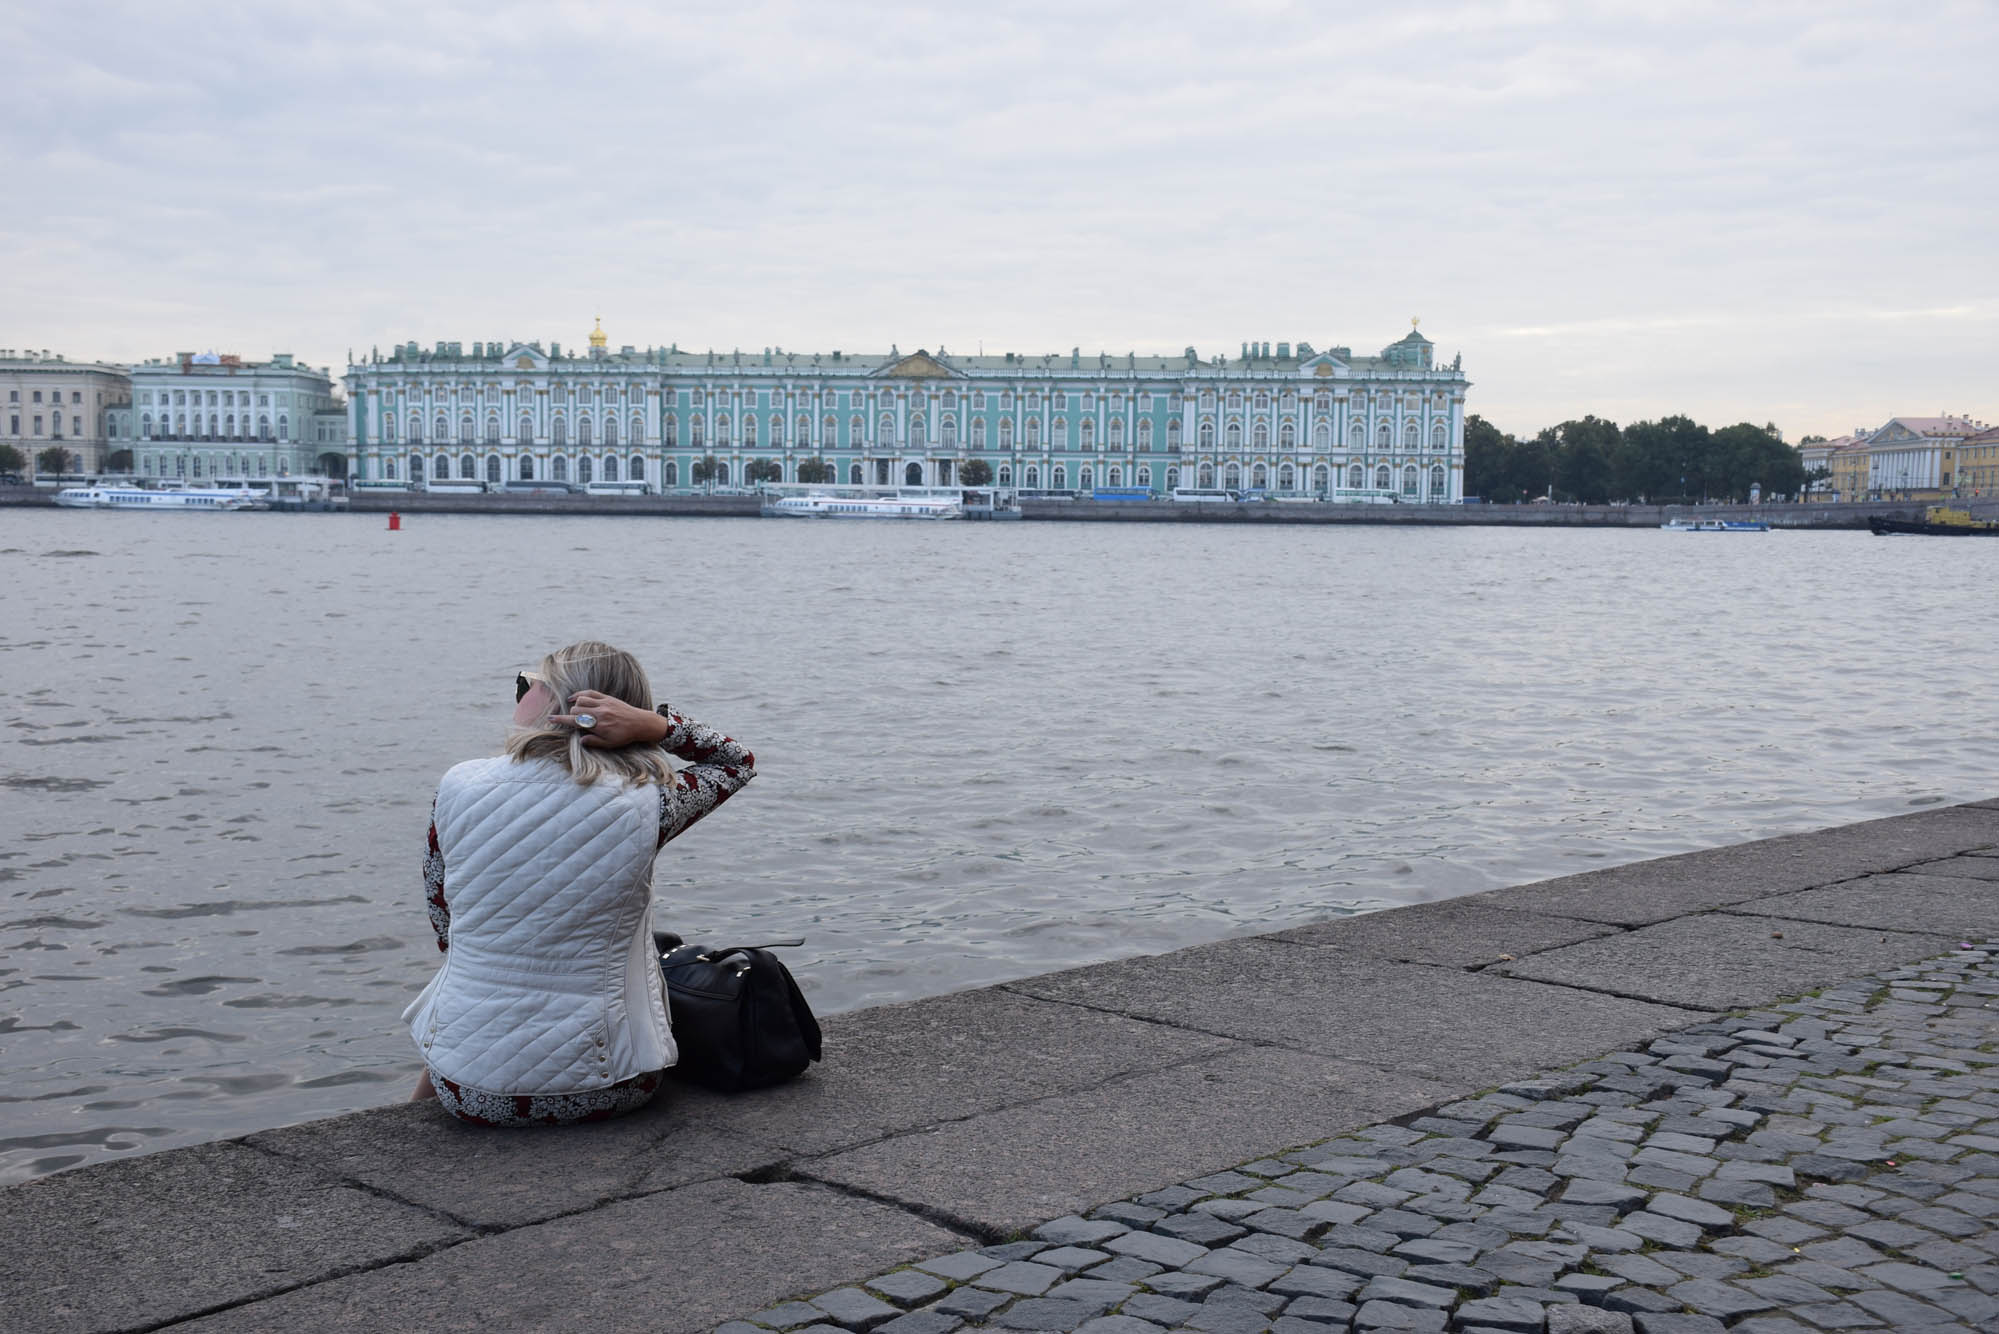 Palácio de Inverno visto da Ilha Vasilyevsky